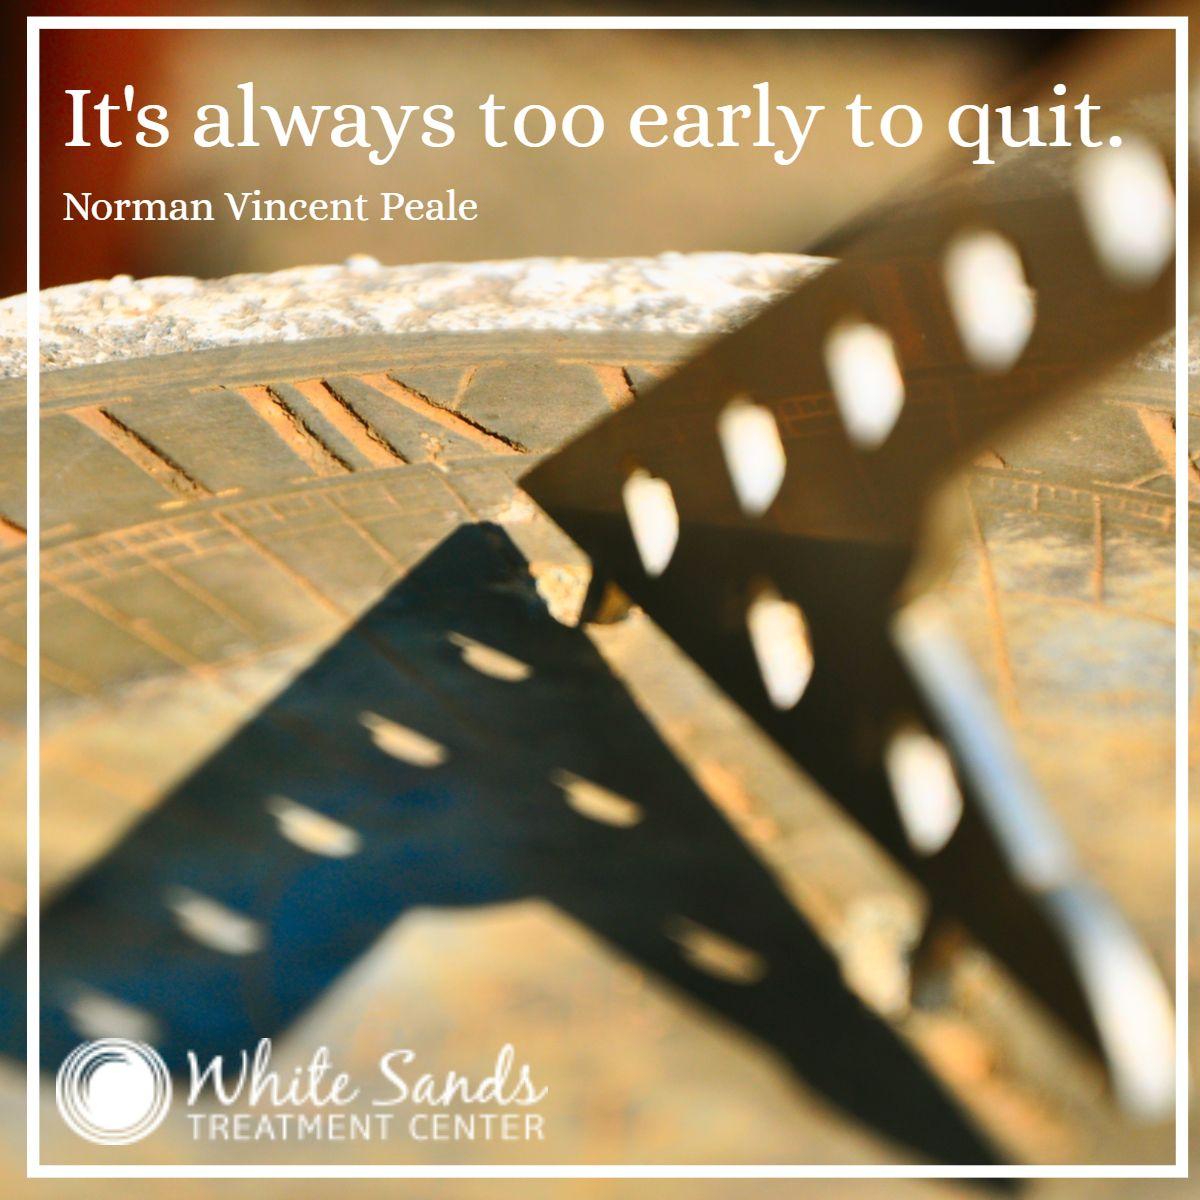 No matter how hard it gets, no matter the setbacks, no